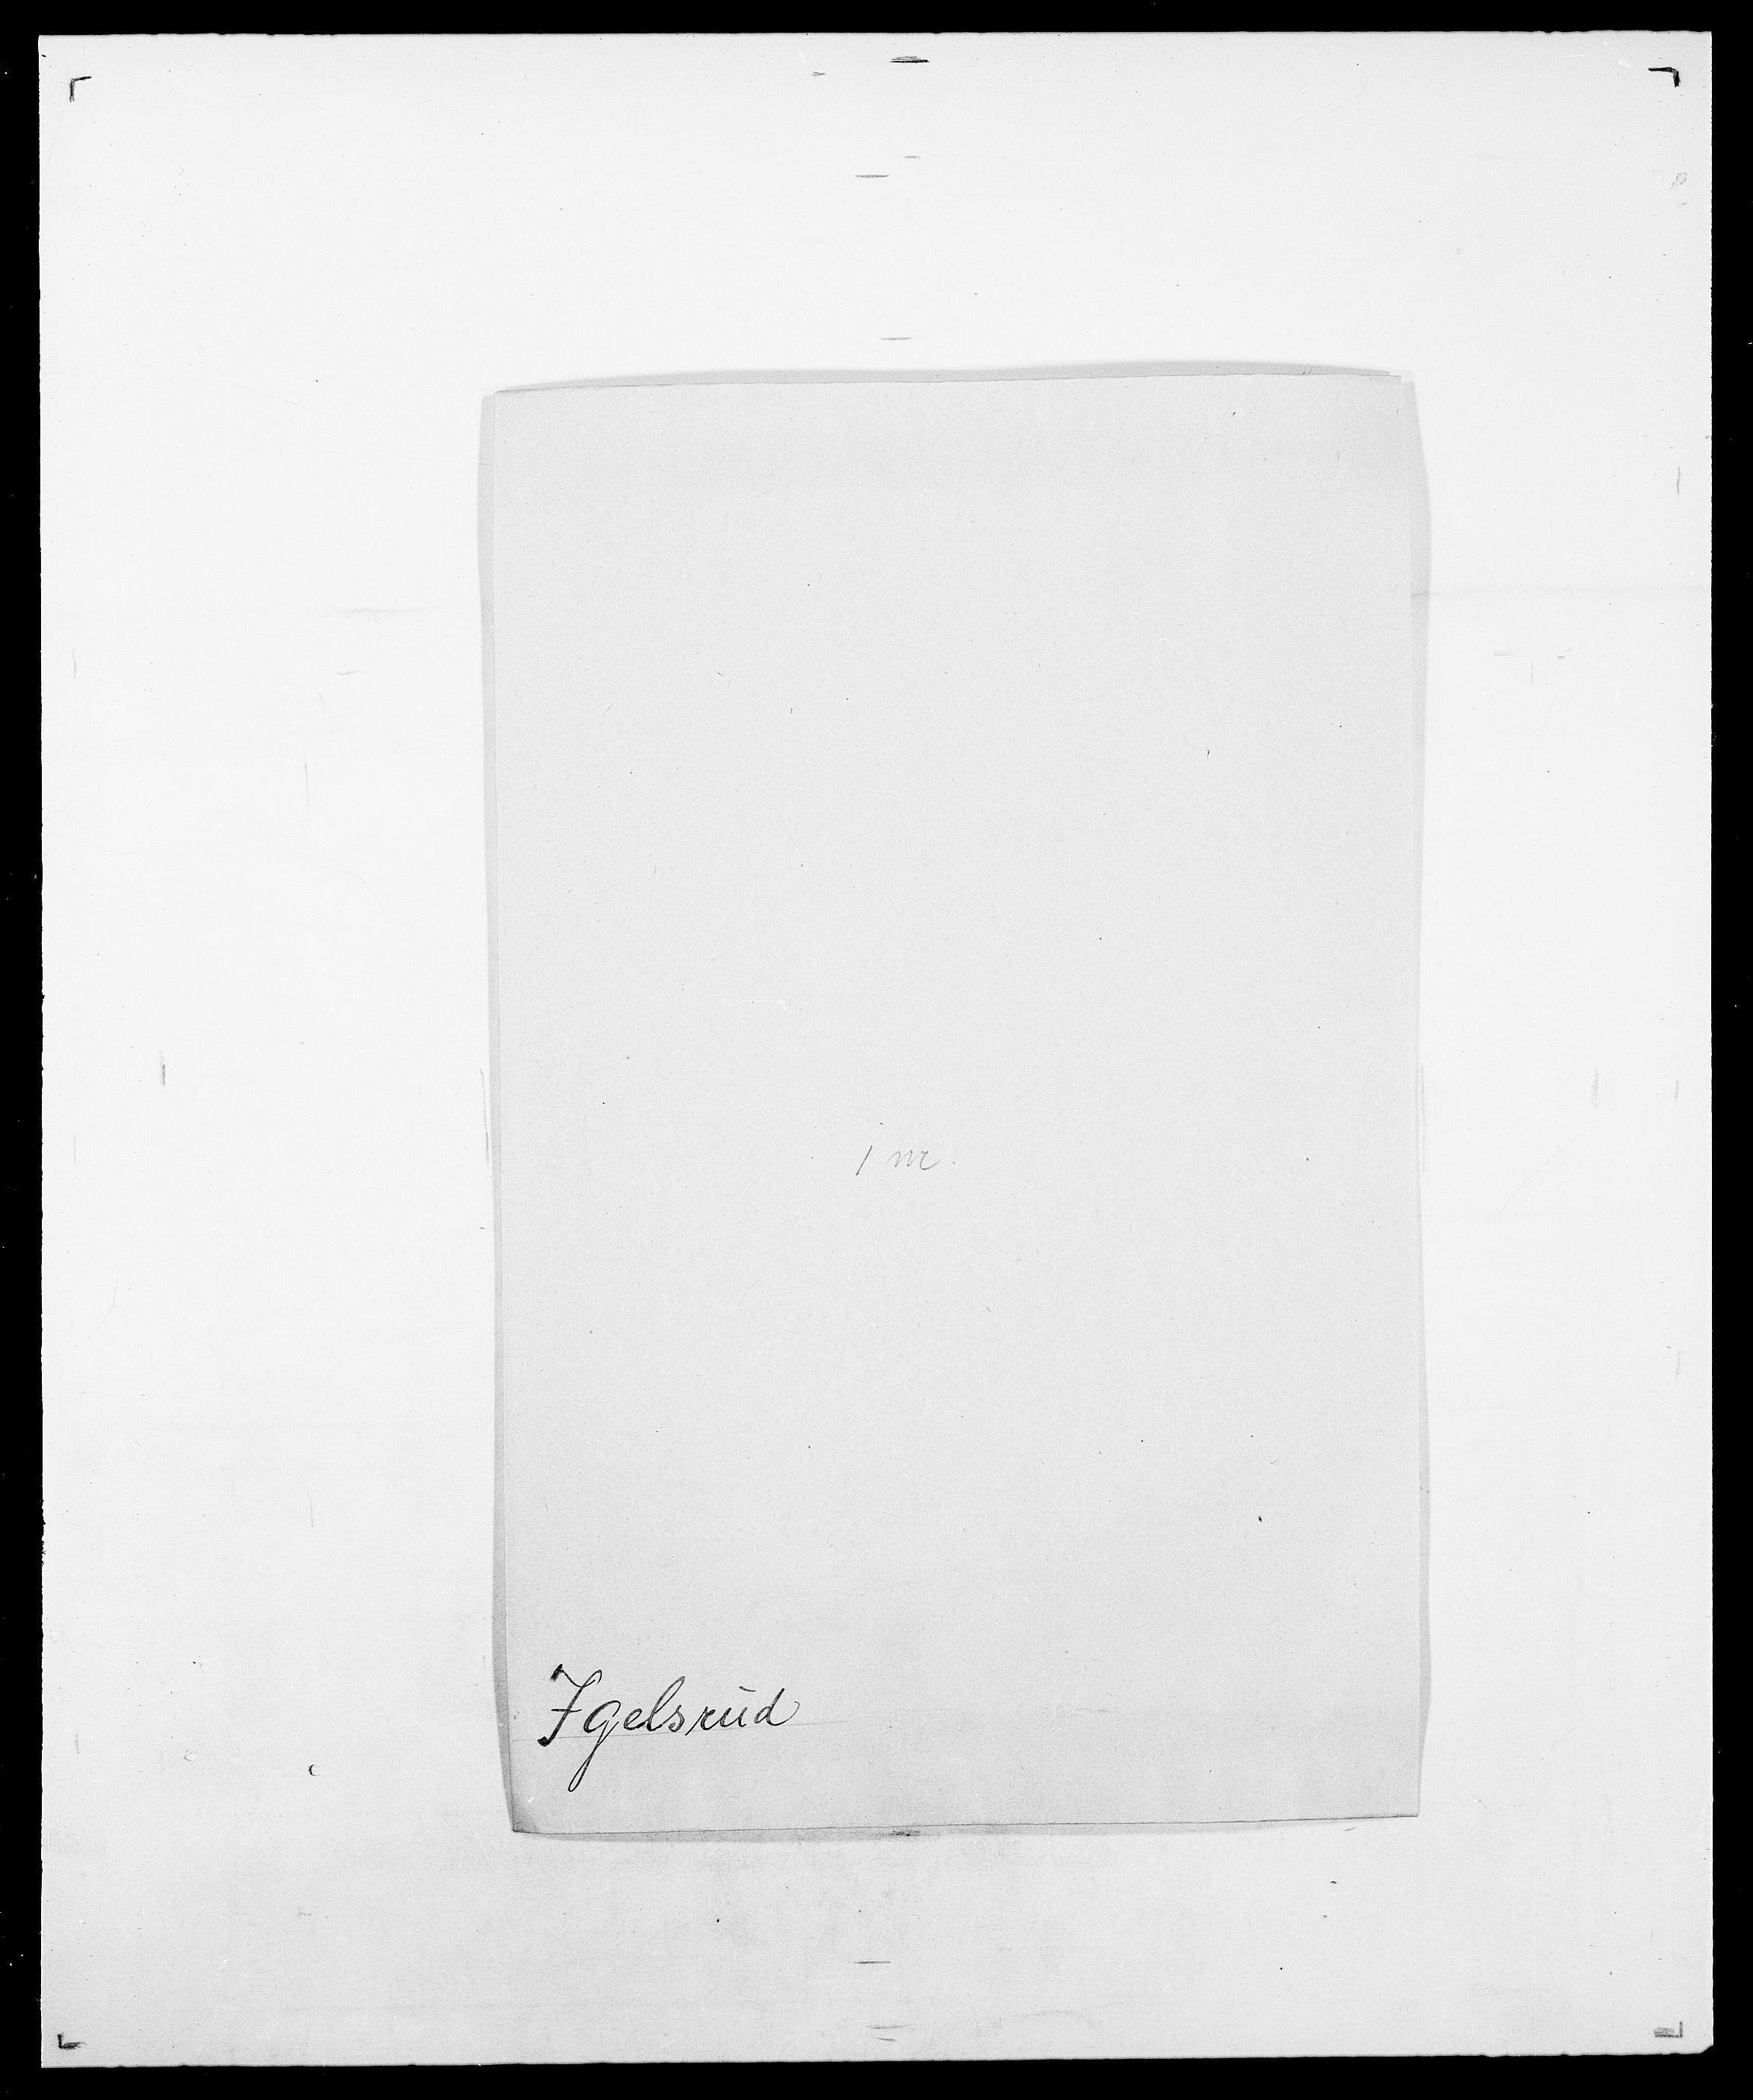 SAO, Delgobe, Charles Antoine - samling, D/Da/L0019: van der Hude - Joys, s. 753